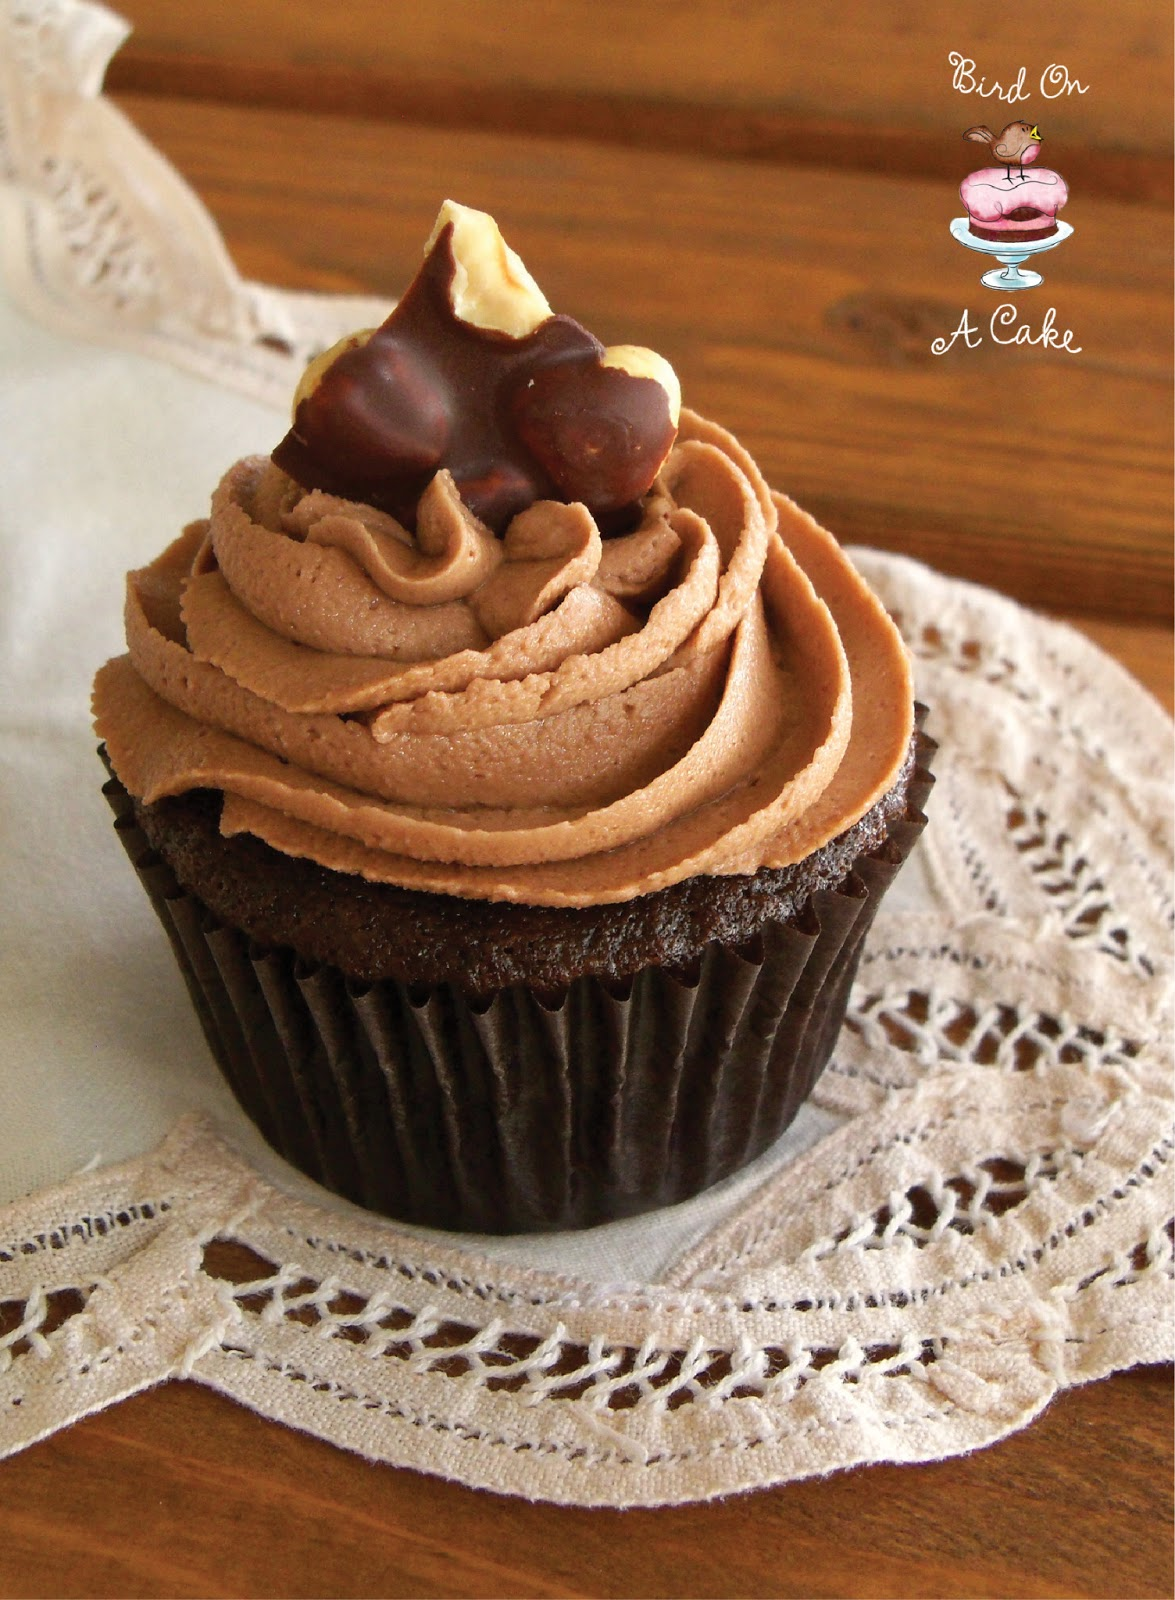 Bird On A Cake: Triple Chocolate Malt Cake